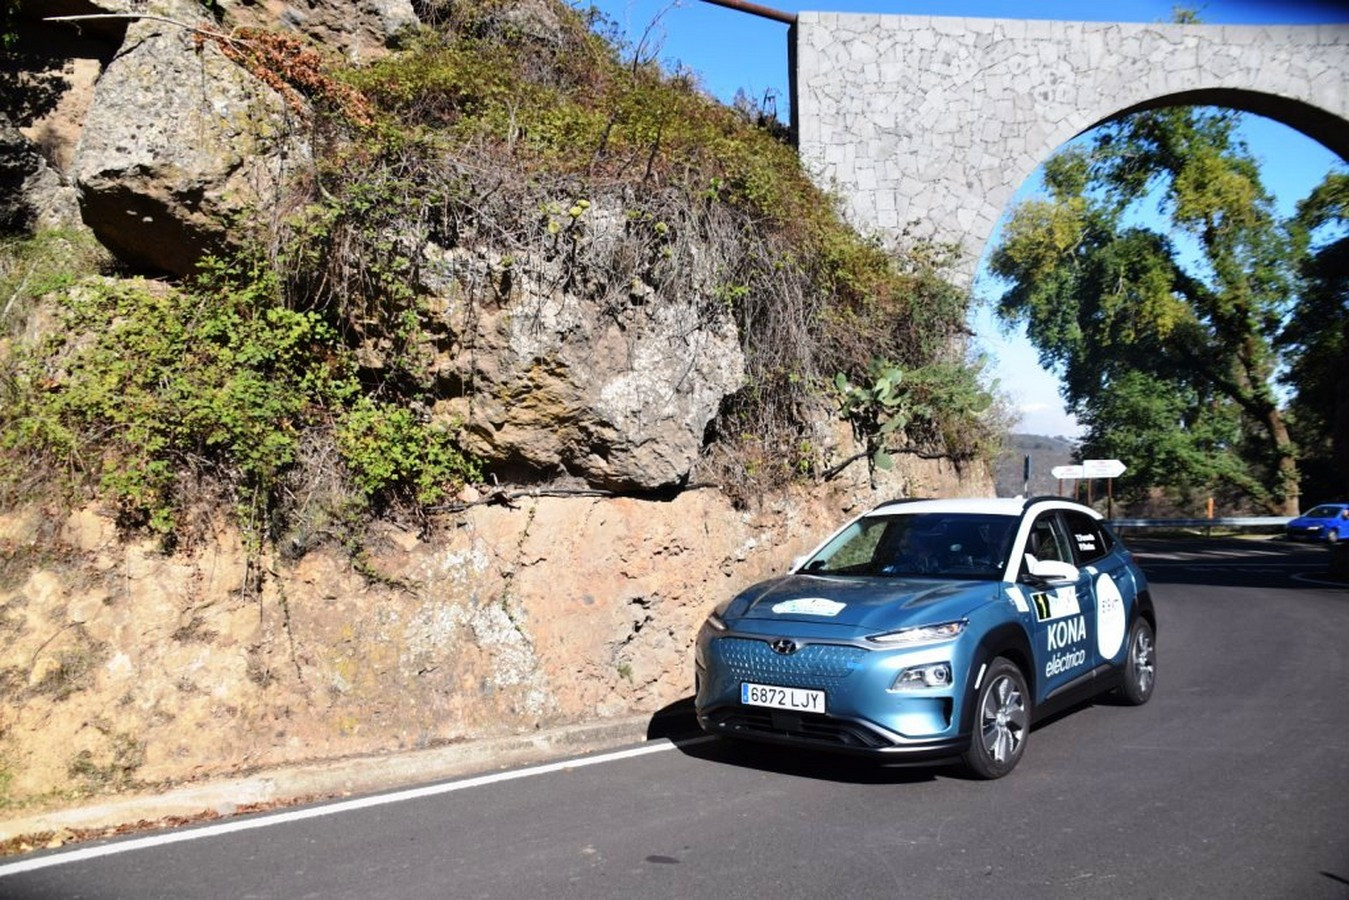 Foronda-Rodas, Hyundai Kona EV